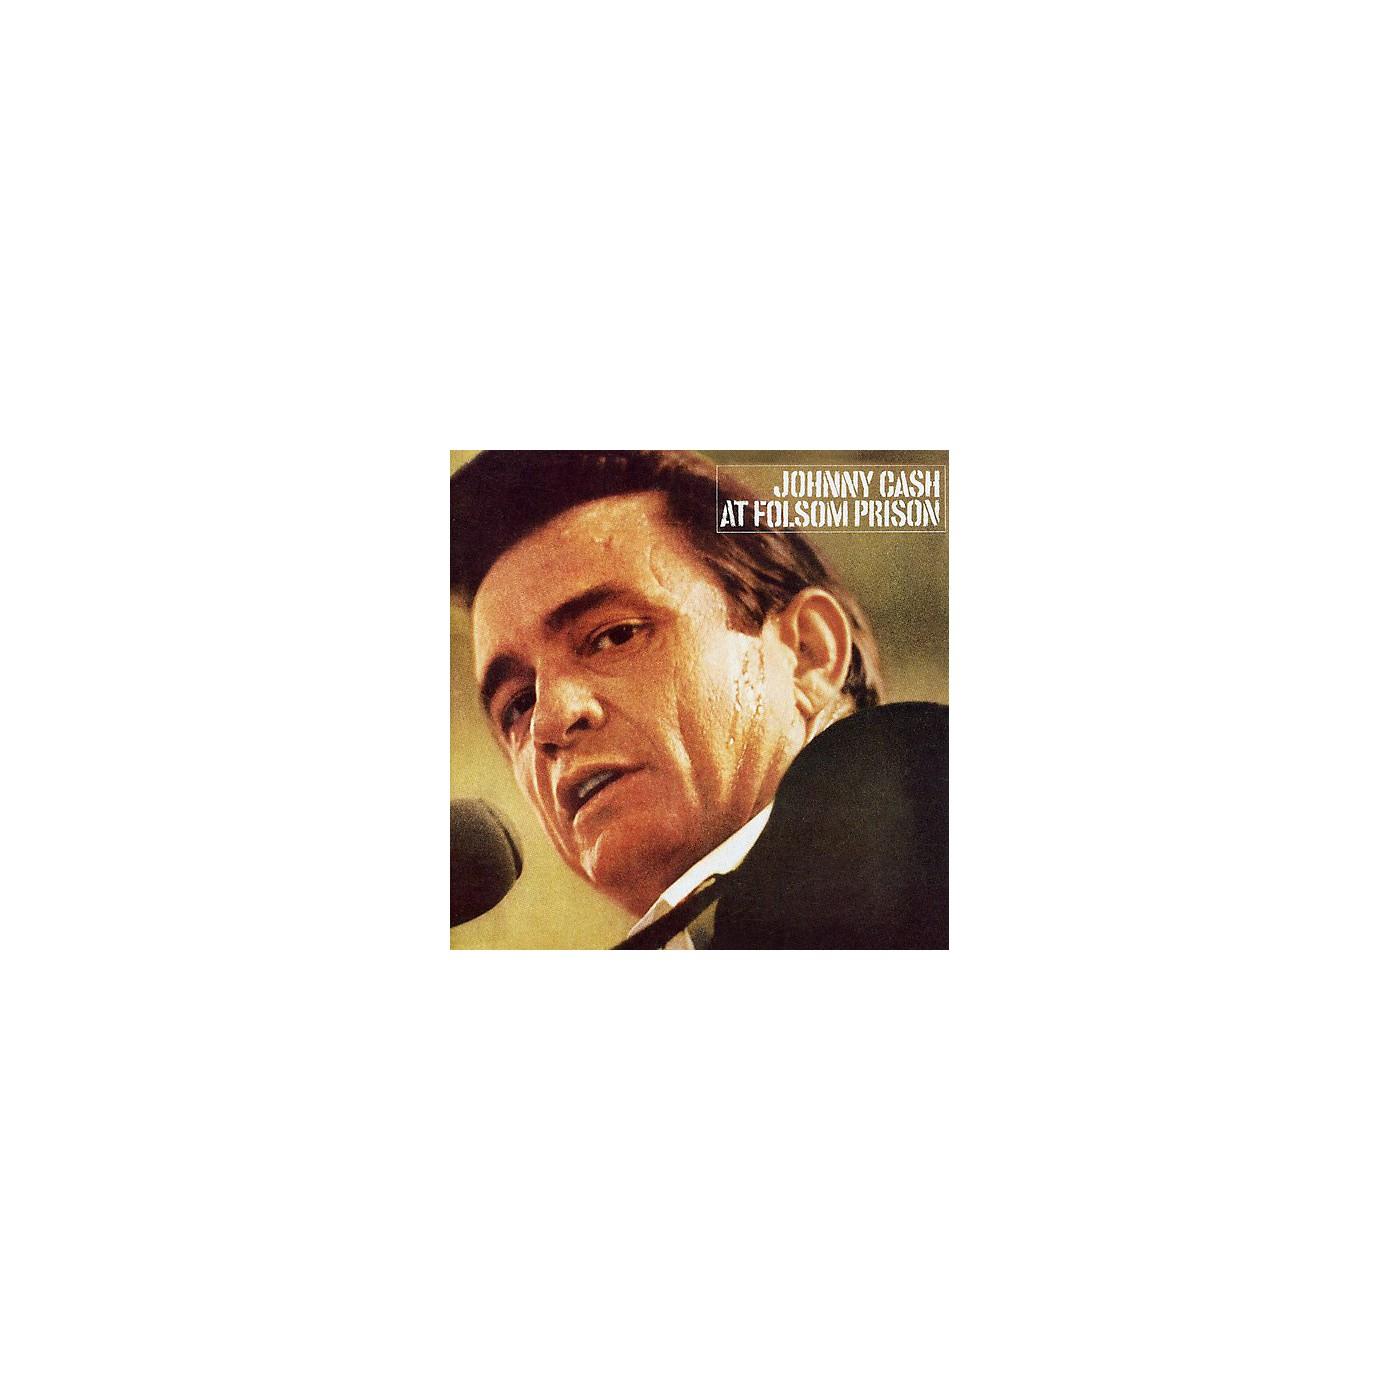 Alliance Johnny Cash - At Folsom Prison (CD) thumbnail